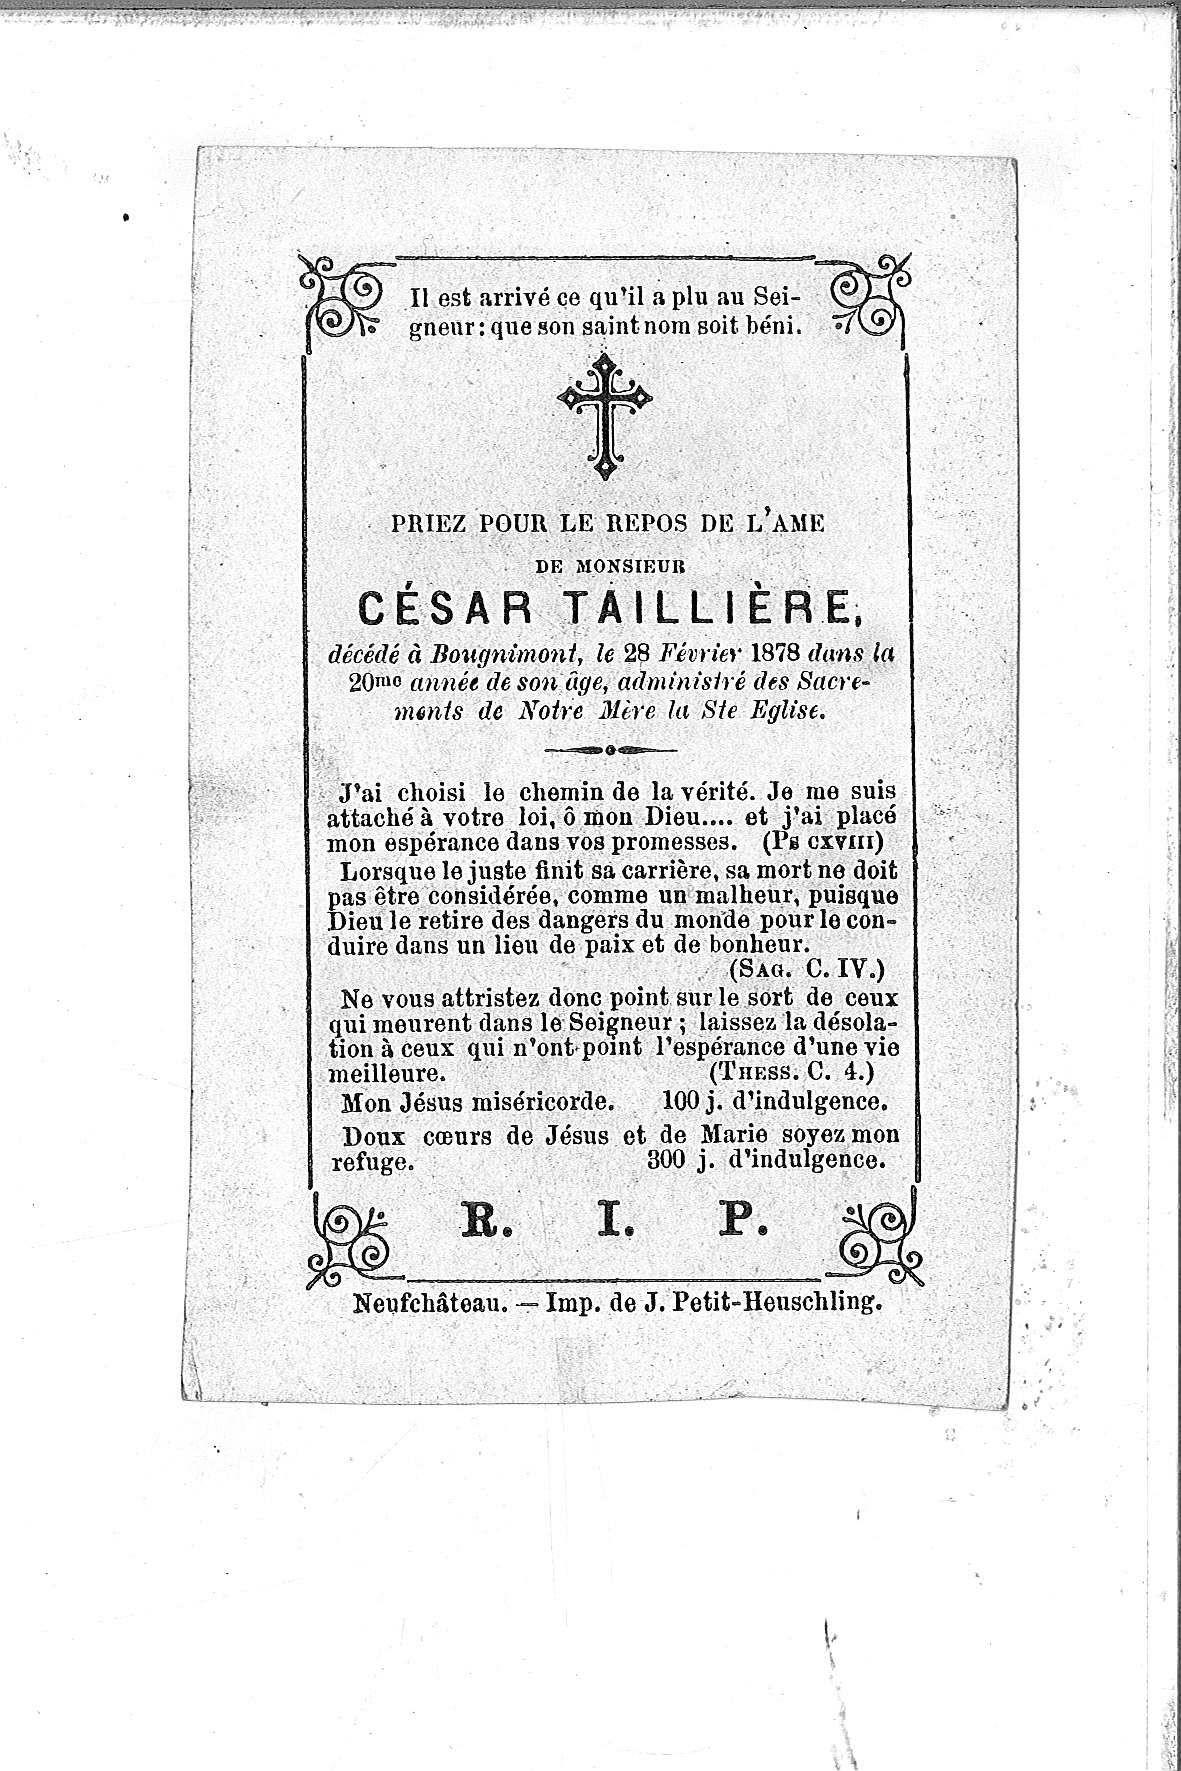 César(1878)20140717084042_00110.jpg